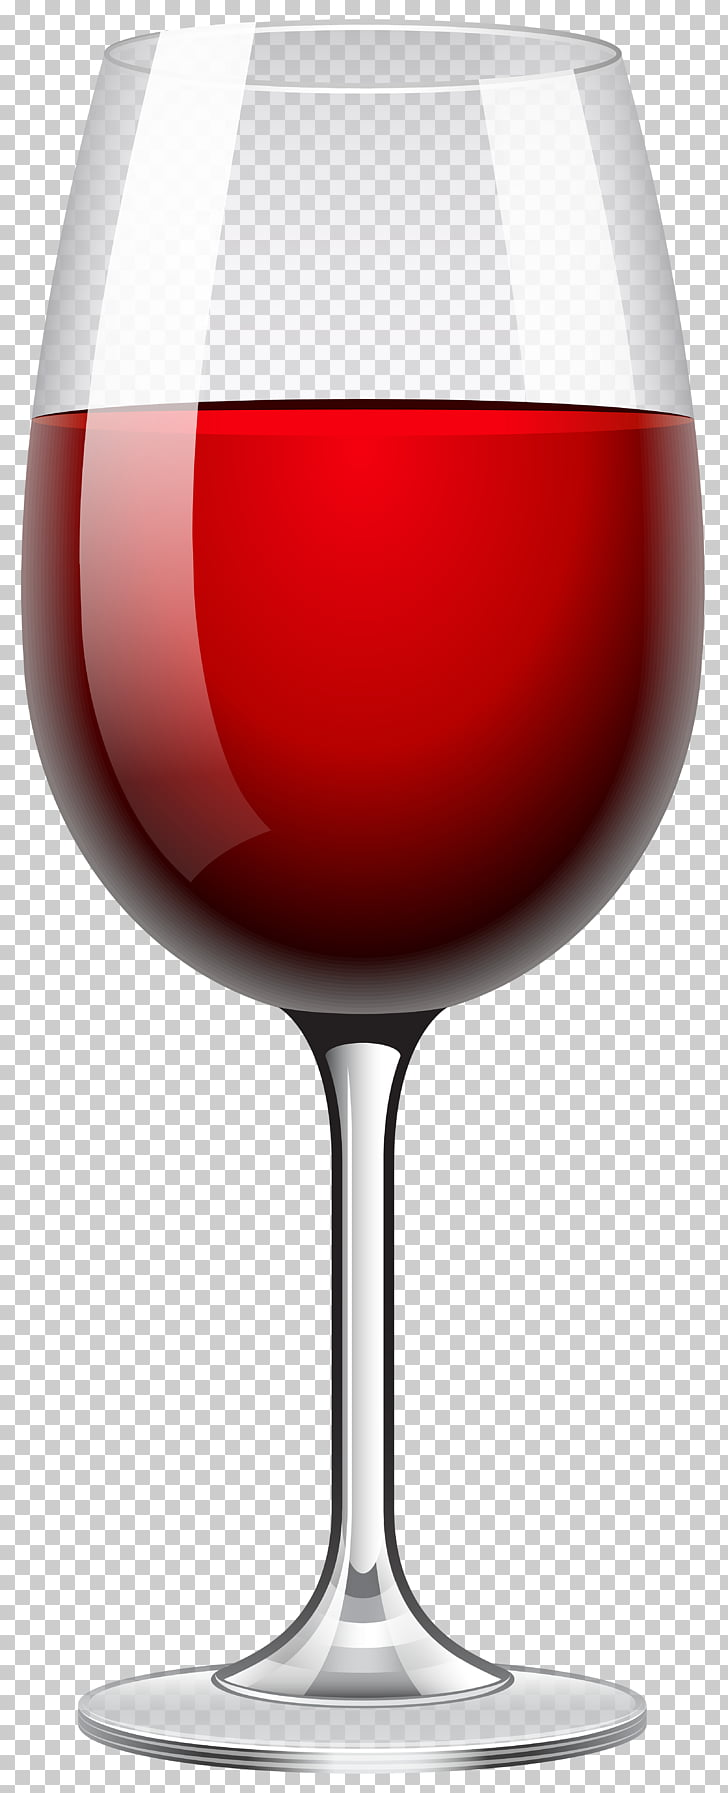 medium resolution of red wine white wine champagne wine glass red wine glass transparent wine filled